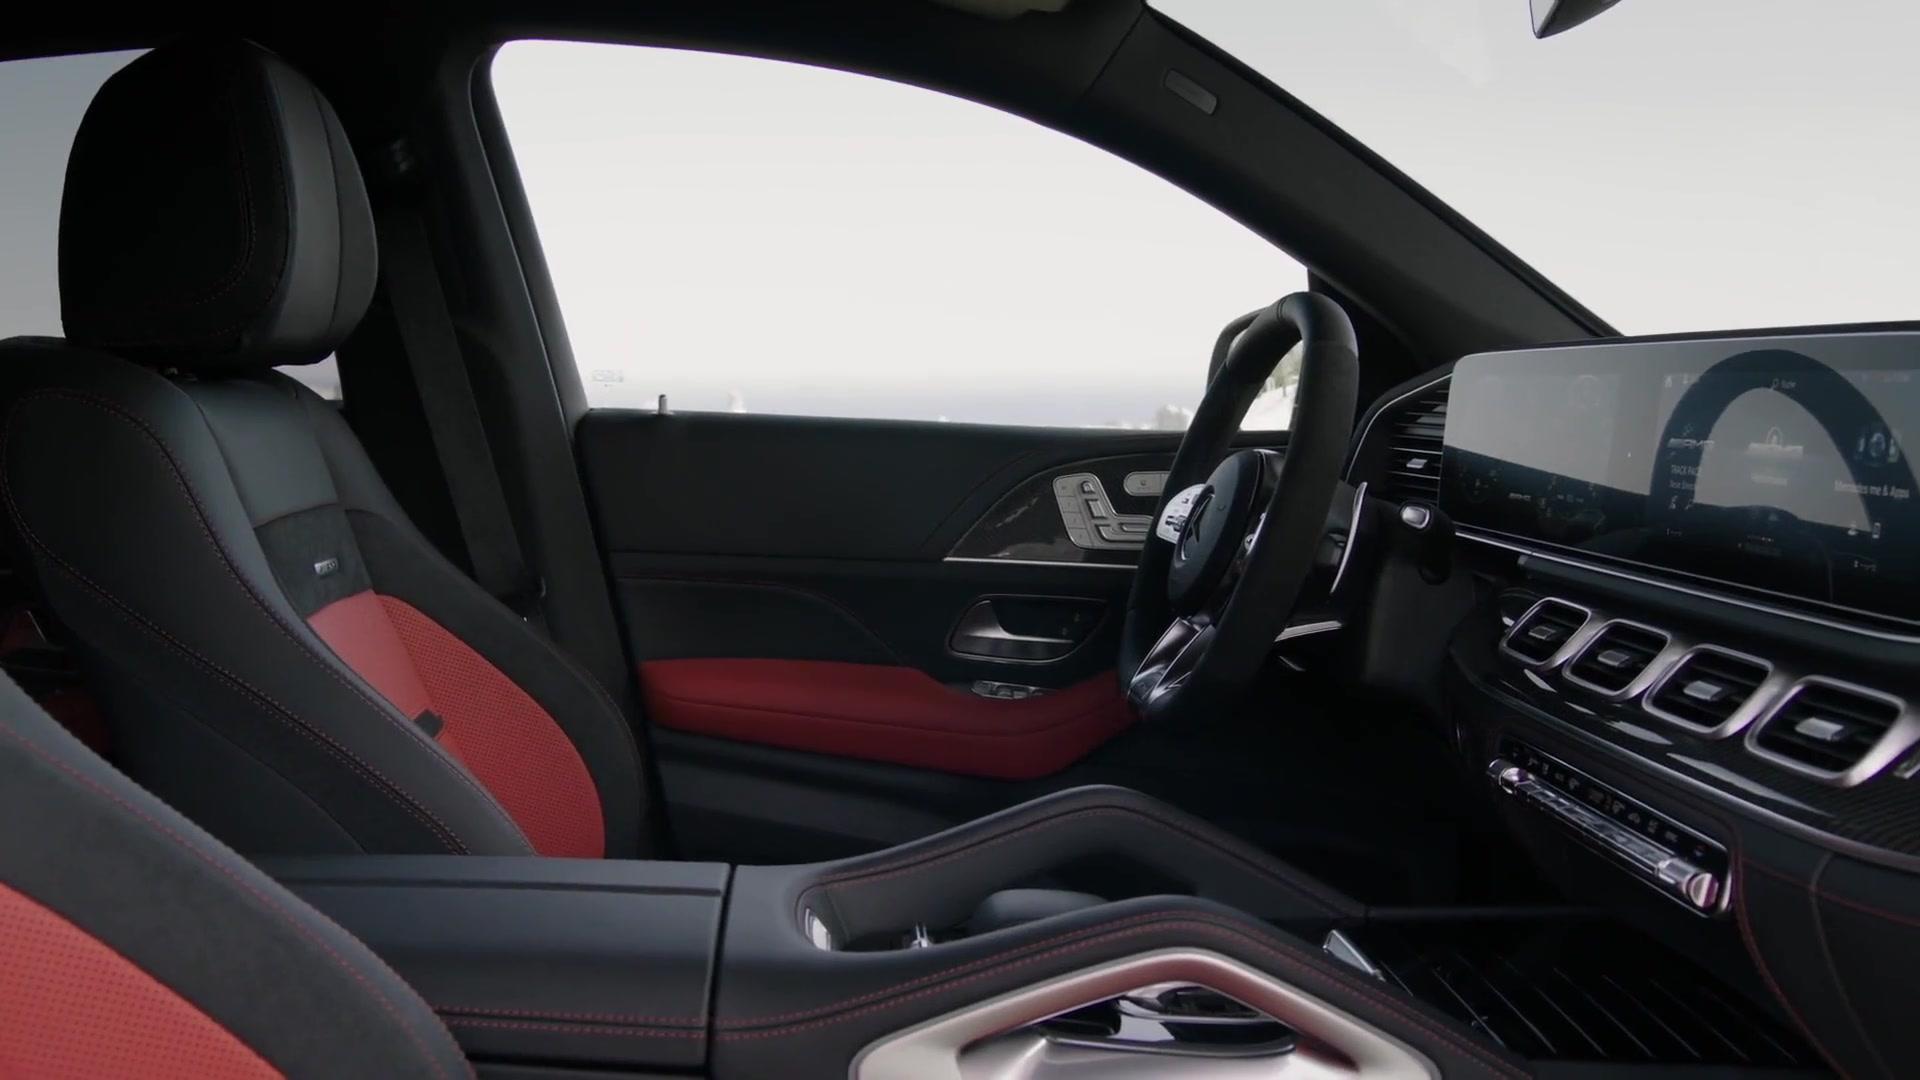 Das neue Mercedes-Benz GLE Coupé – Das muss man erfahren – Mercedes-Benz User Experience